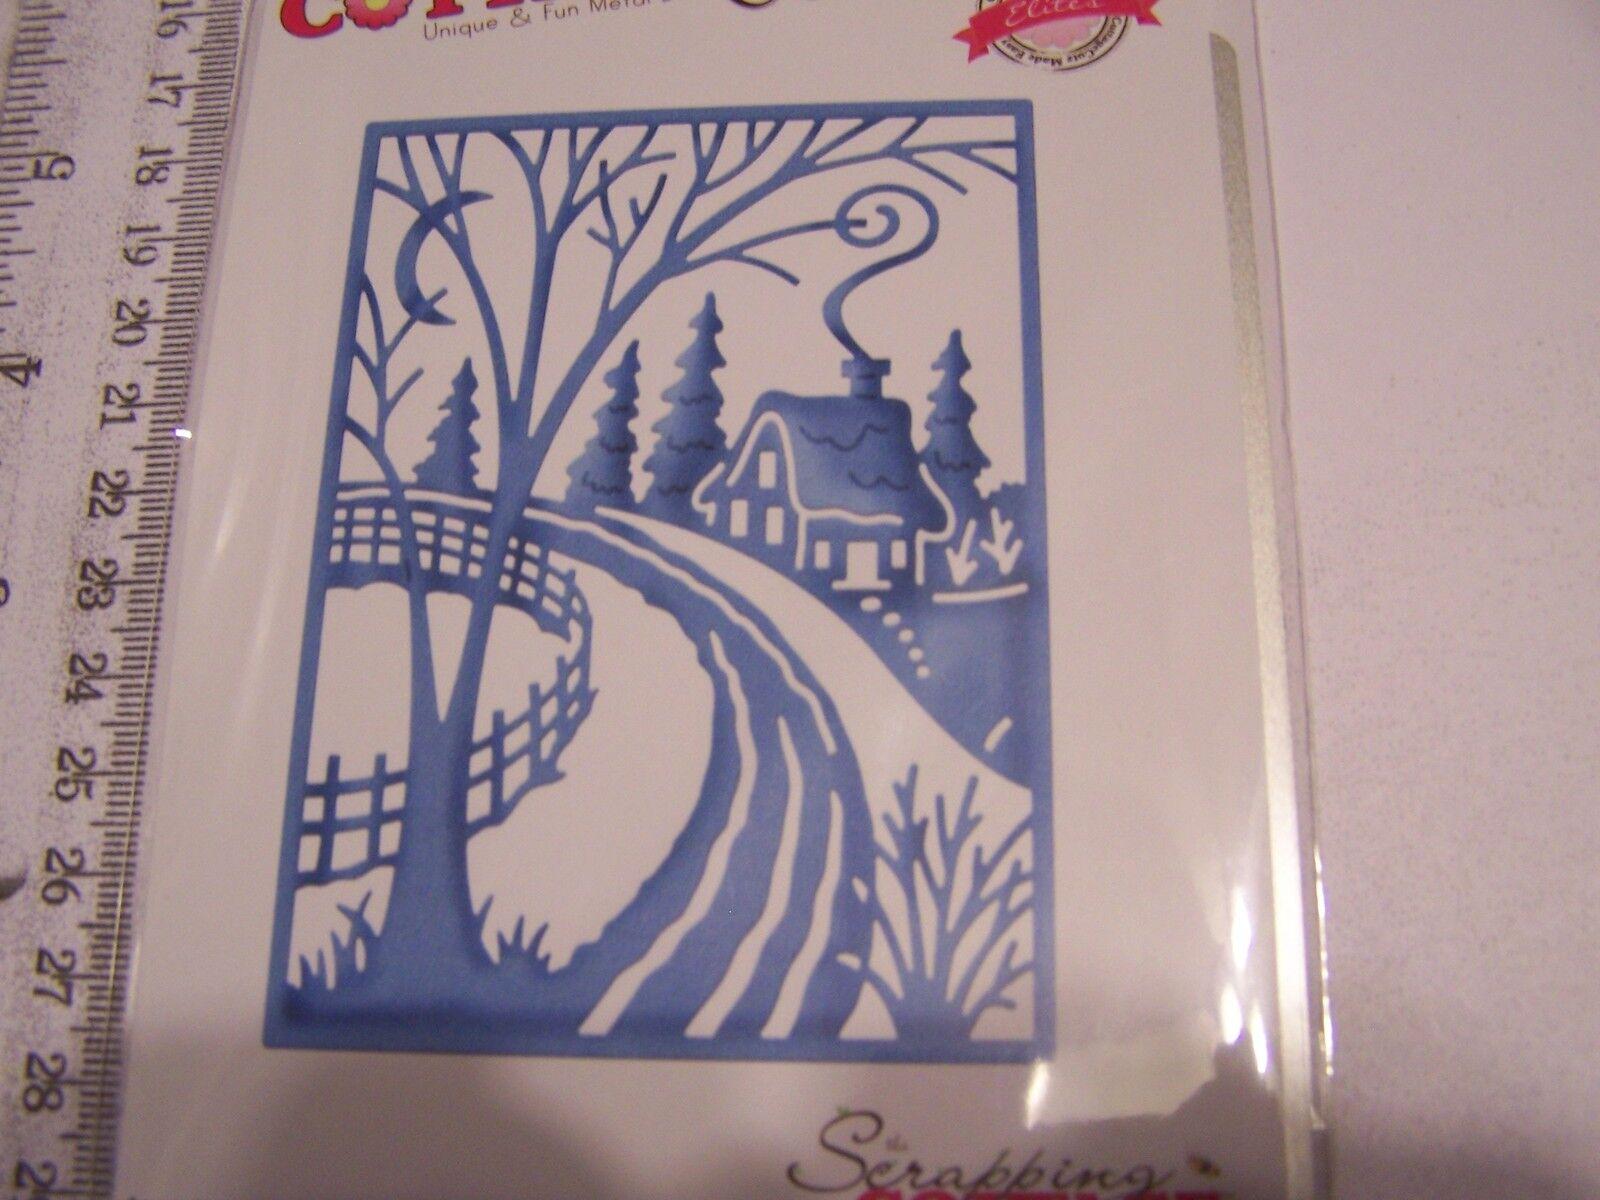 curious*goods*1313 CREATIVE CARDS